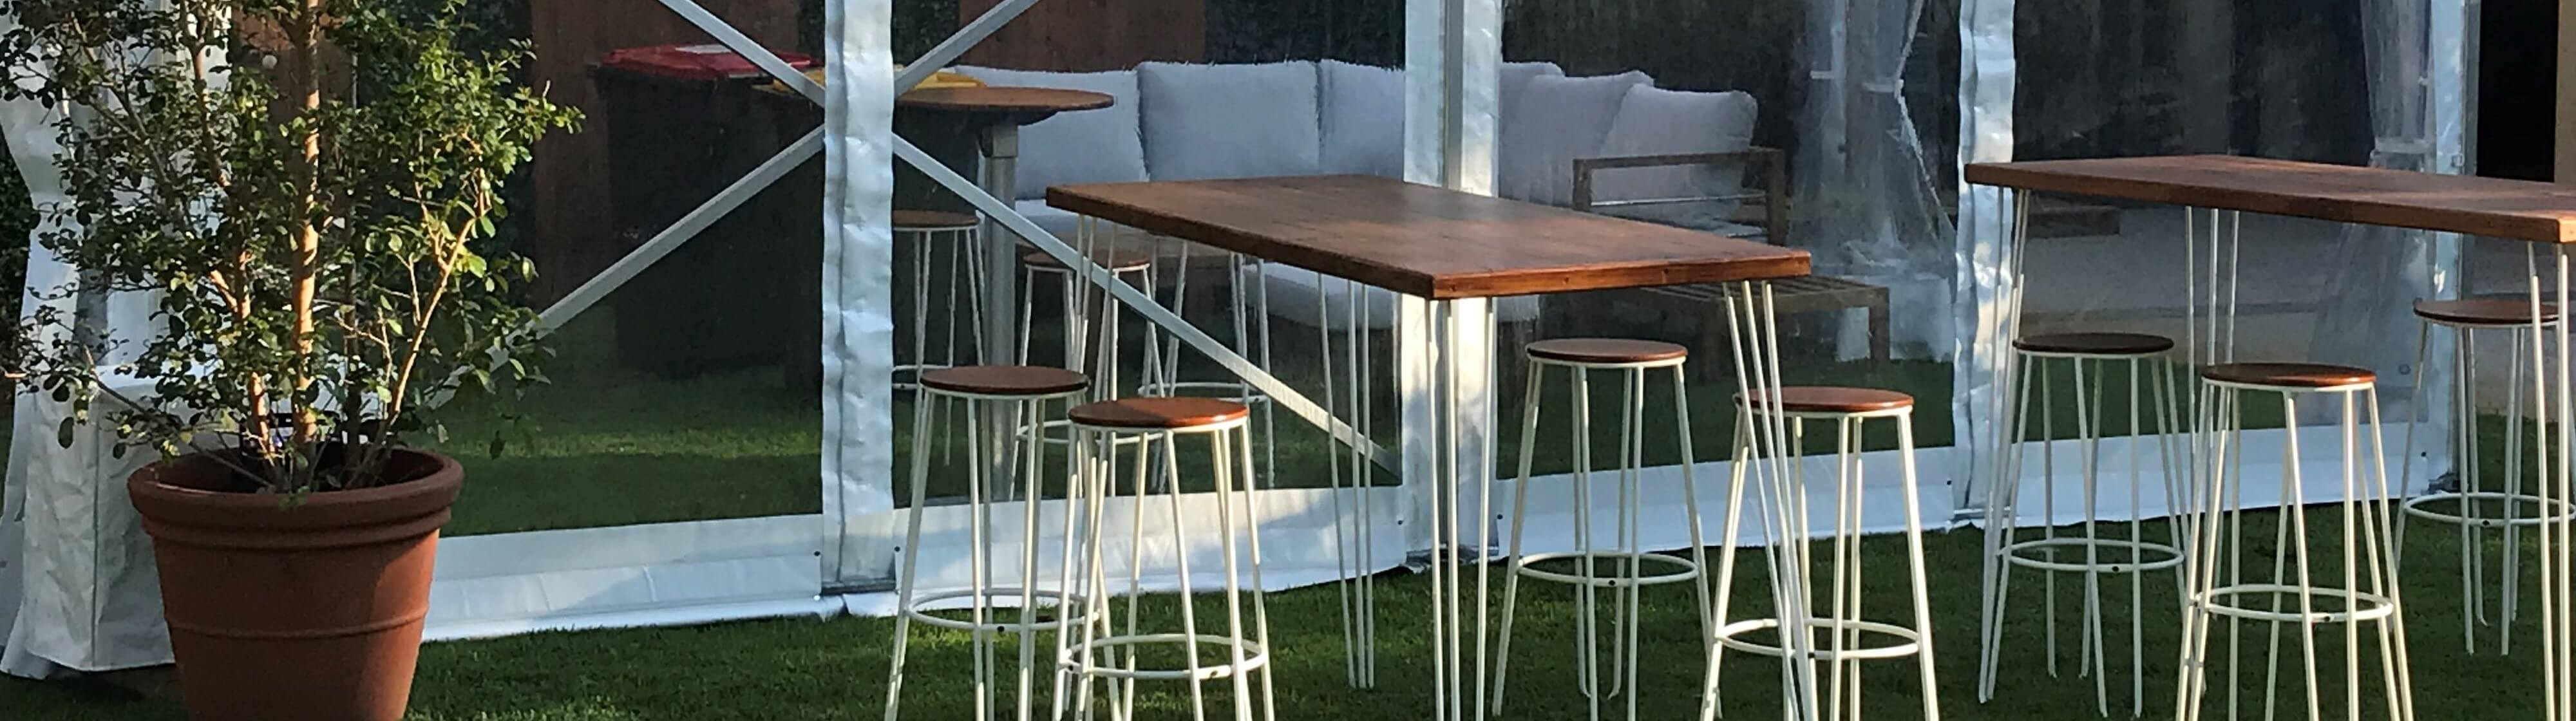 Cocktail-Furniture-Hire-Perth.jpg